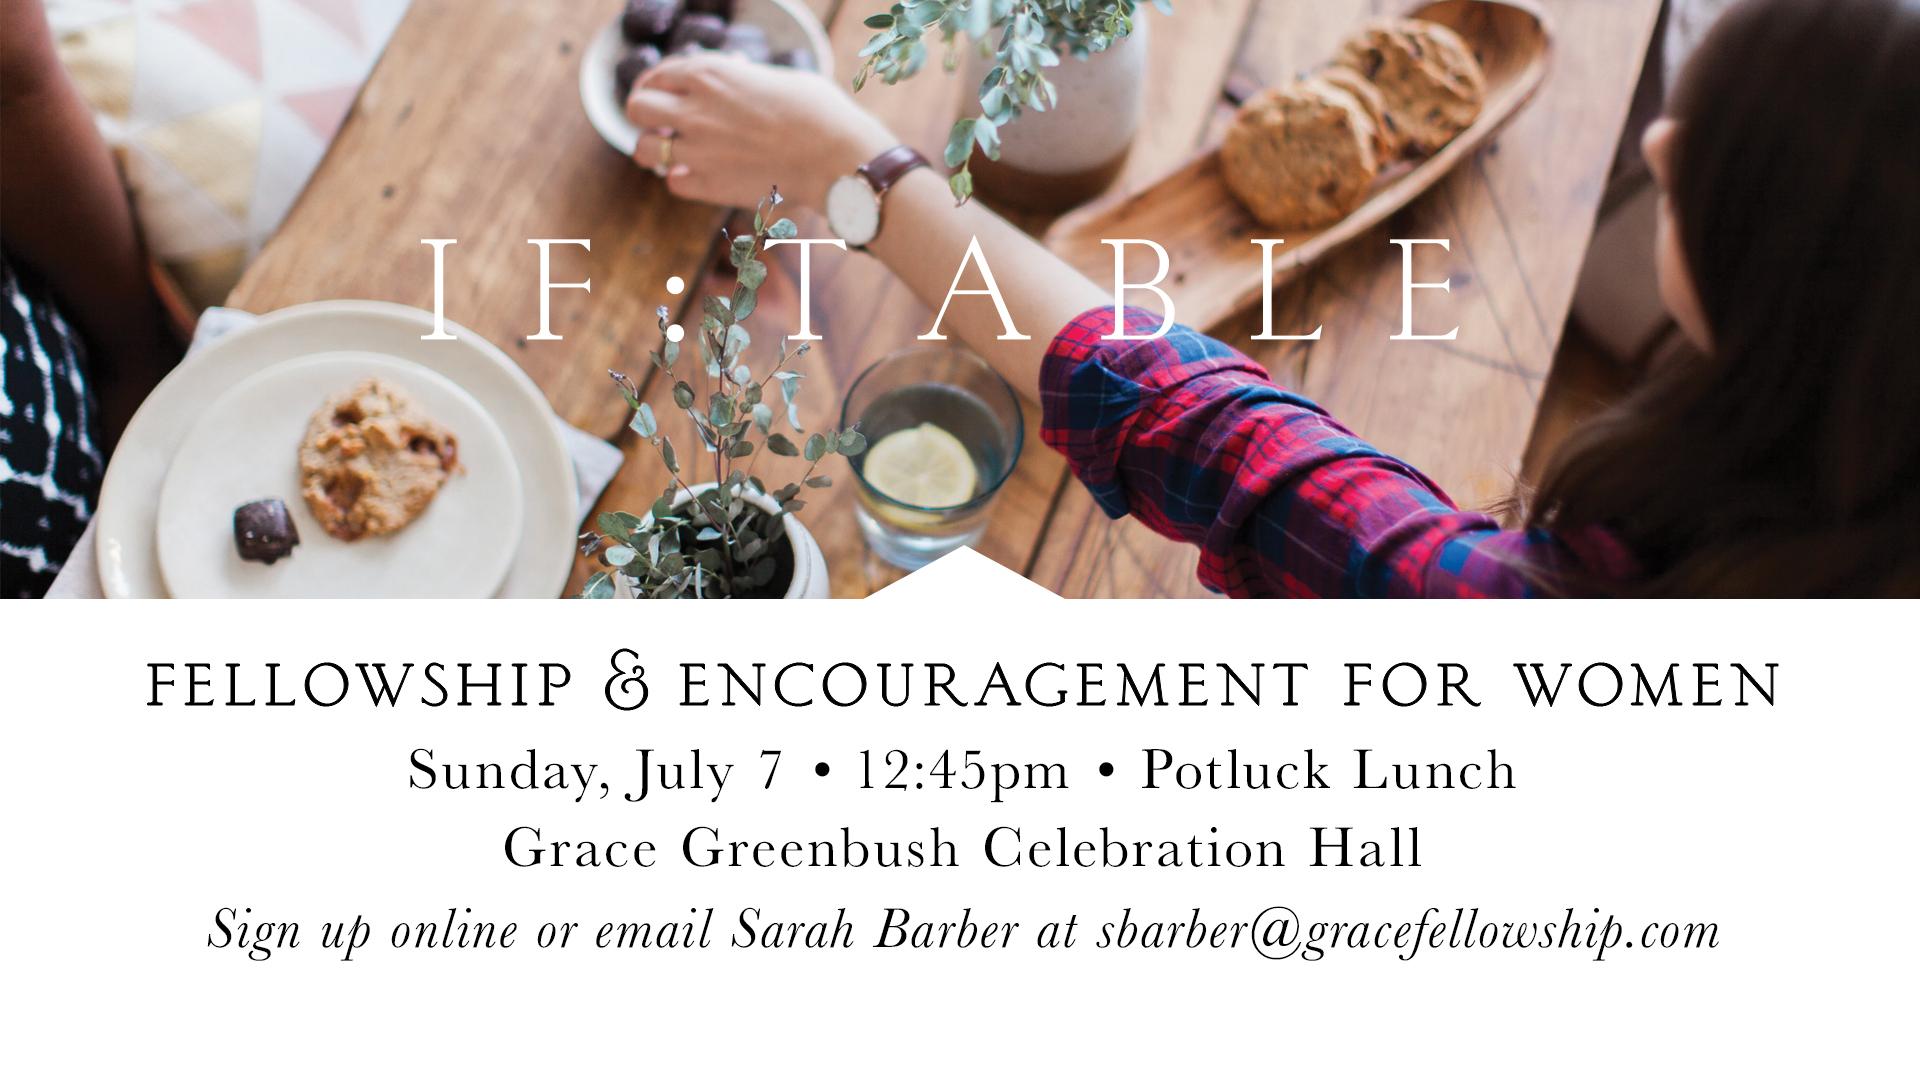 Greenbush: IF – Table